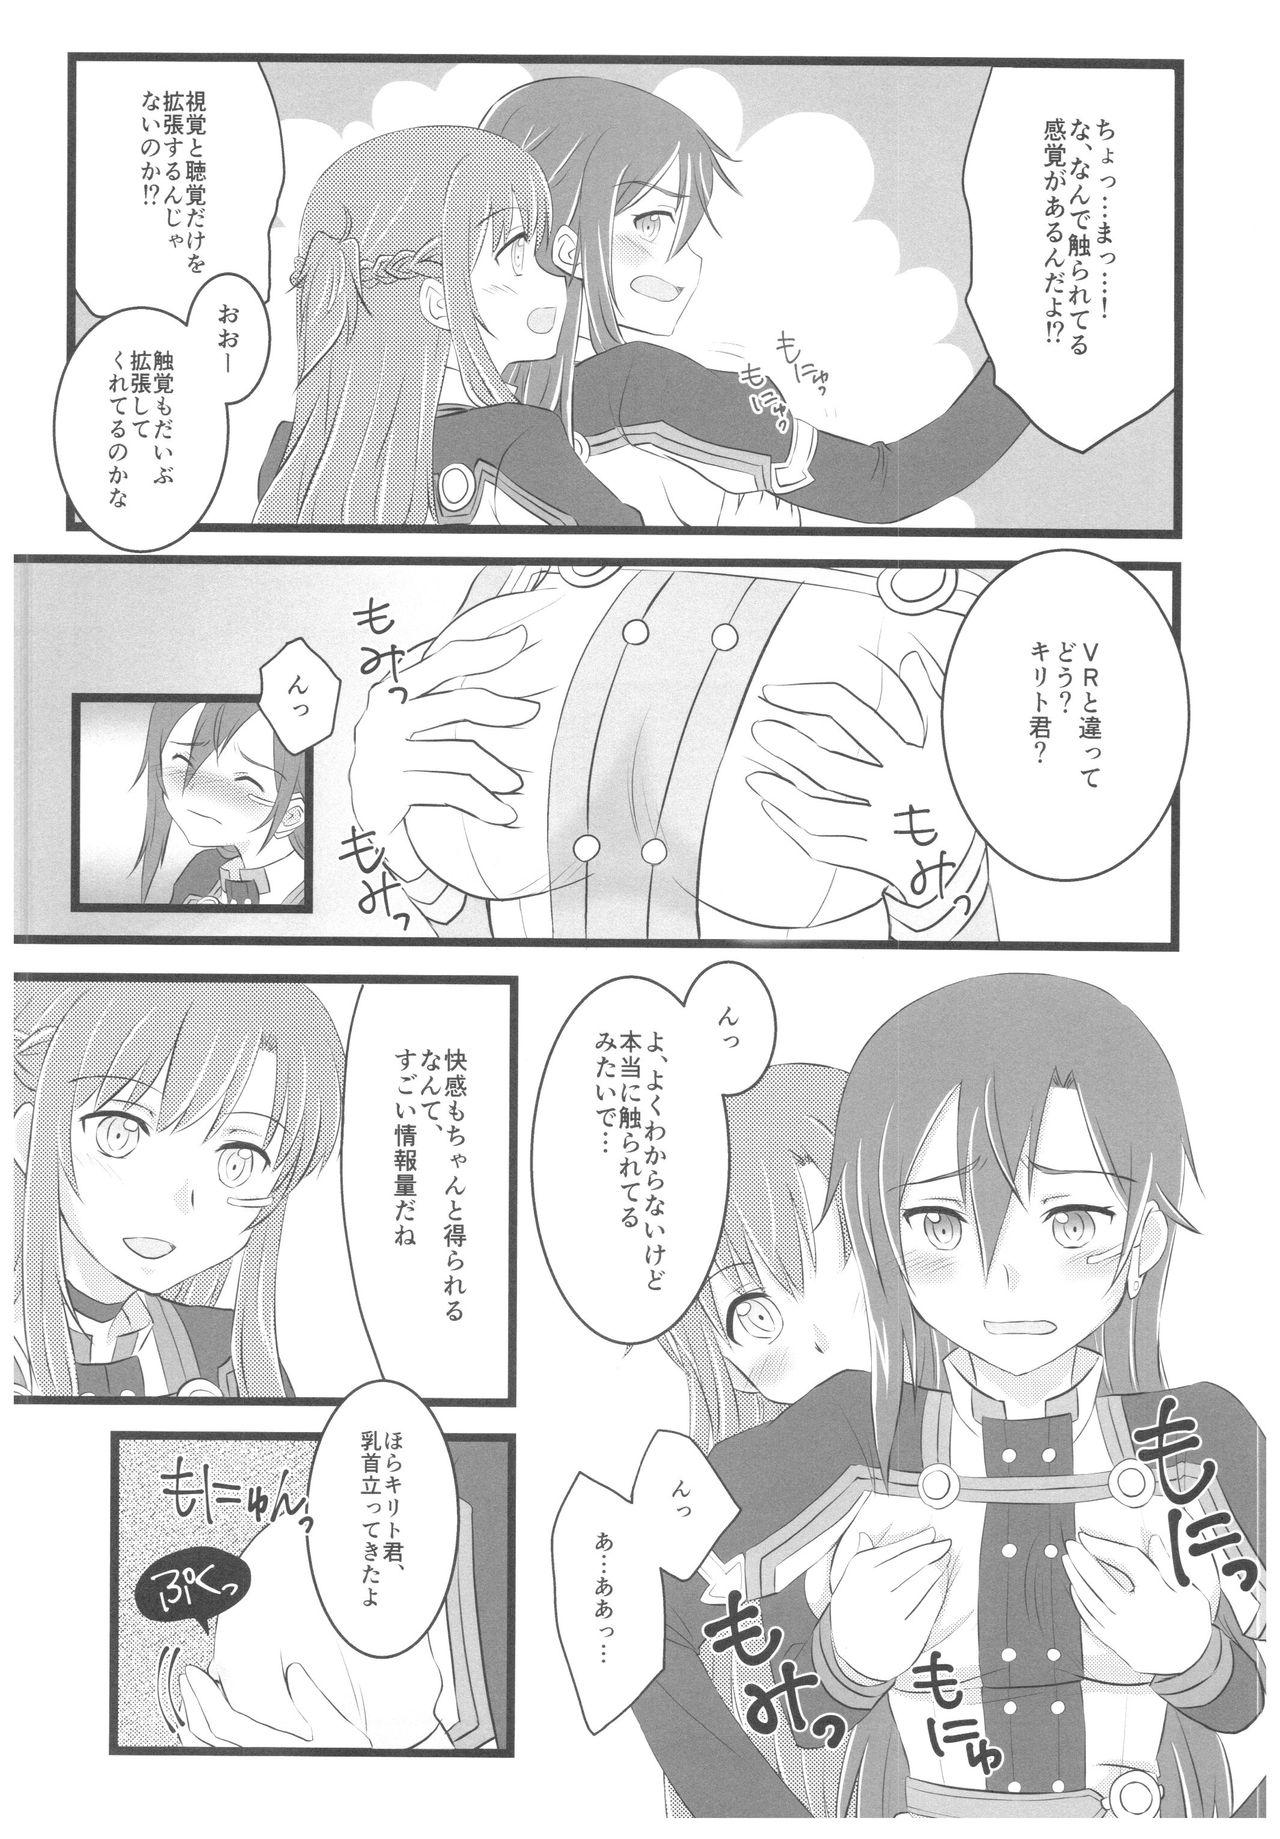 Kiriko-chan to Asobou! 4 3